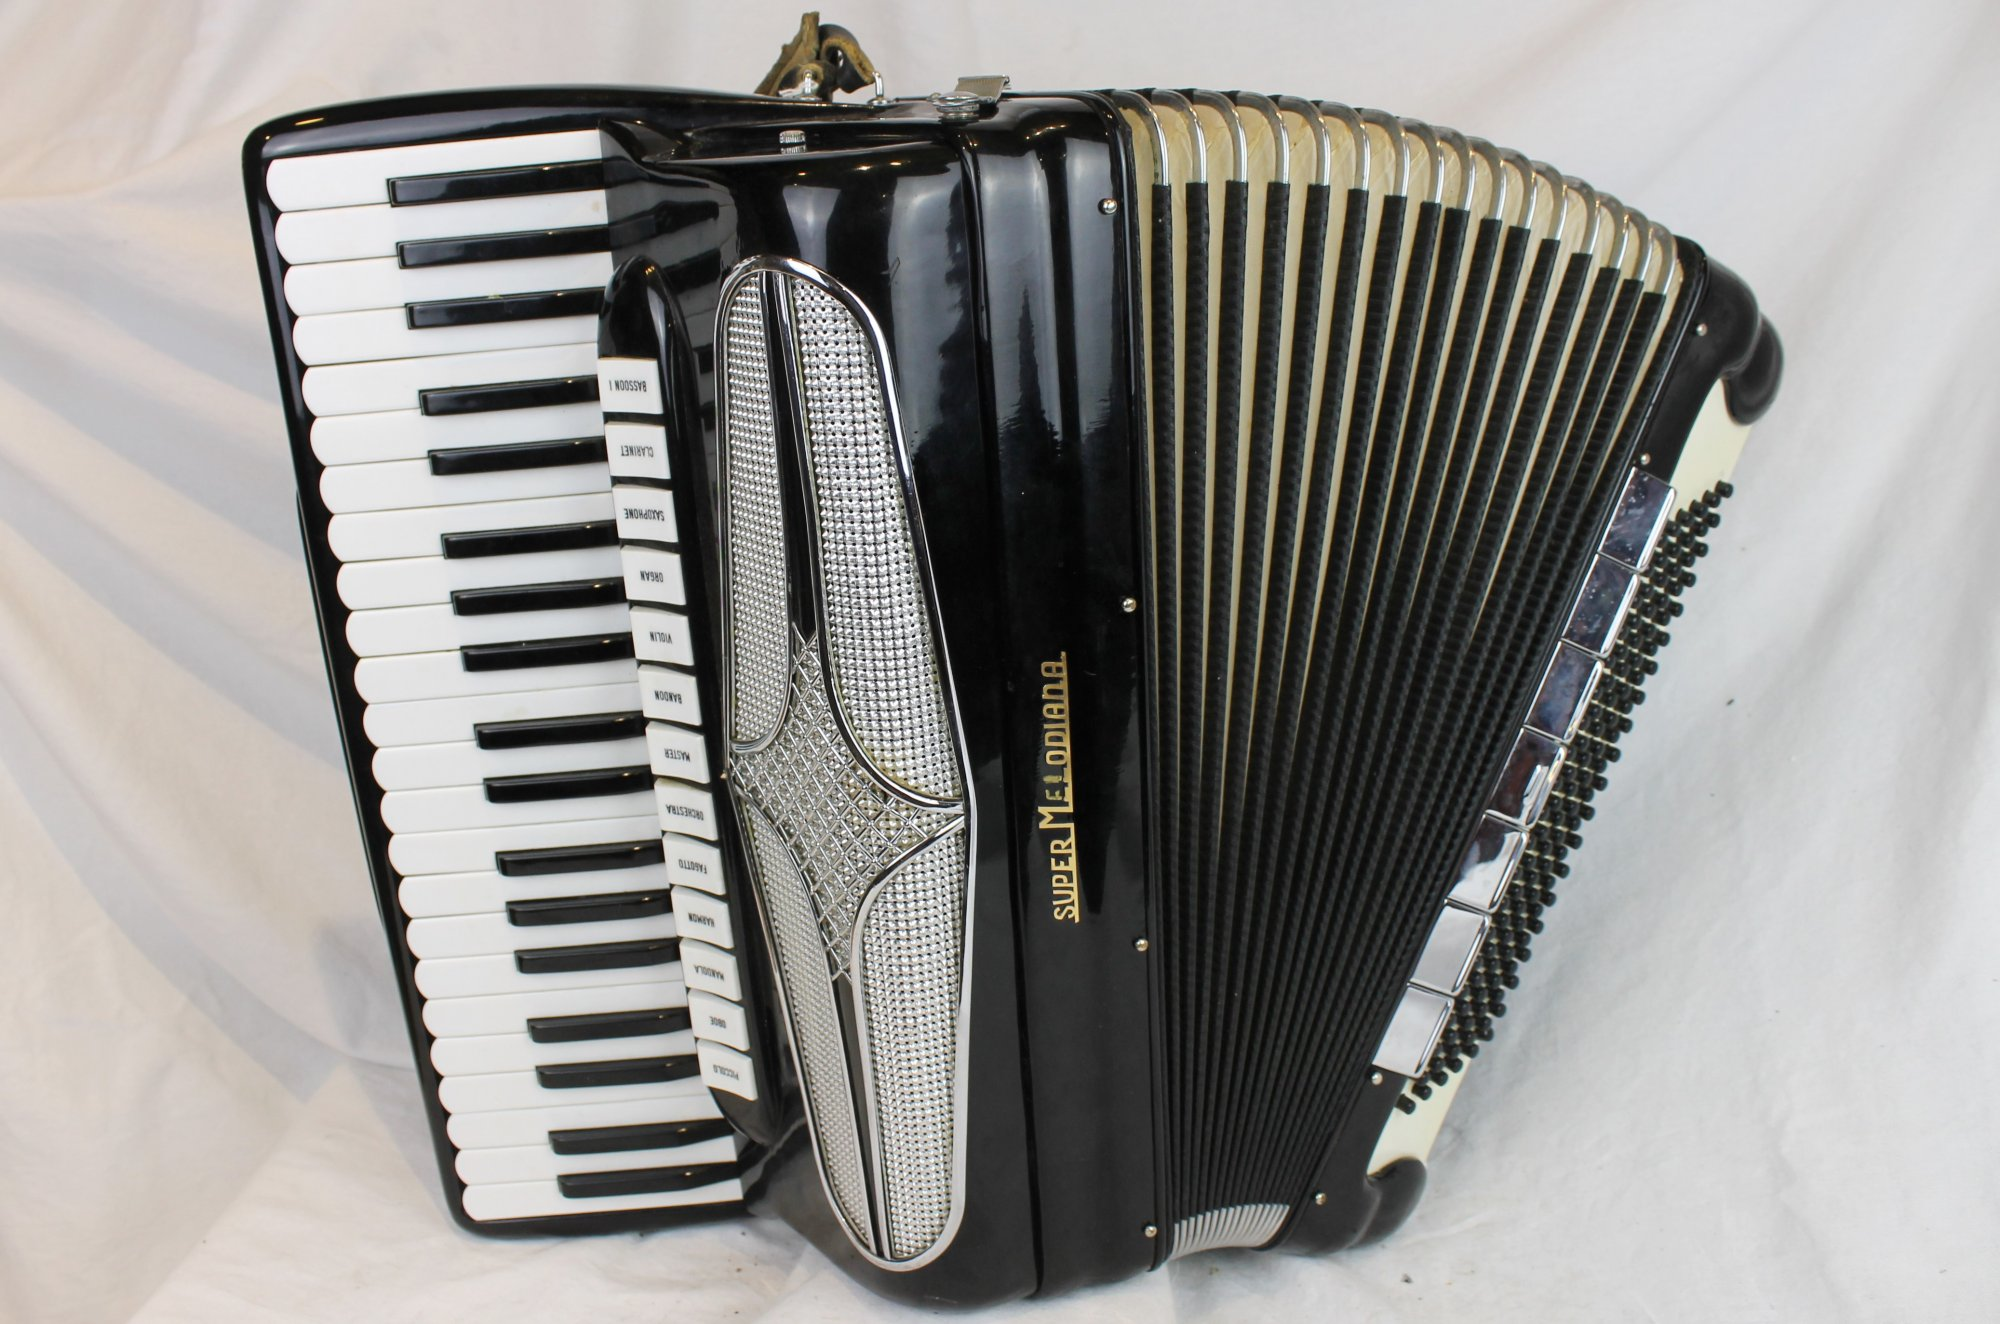 3974 - Black Super Melodiana Piano Accordion LMMH 41 120